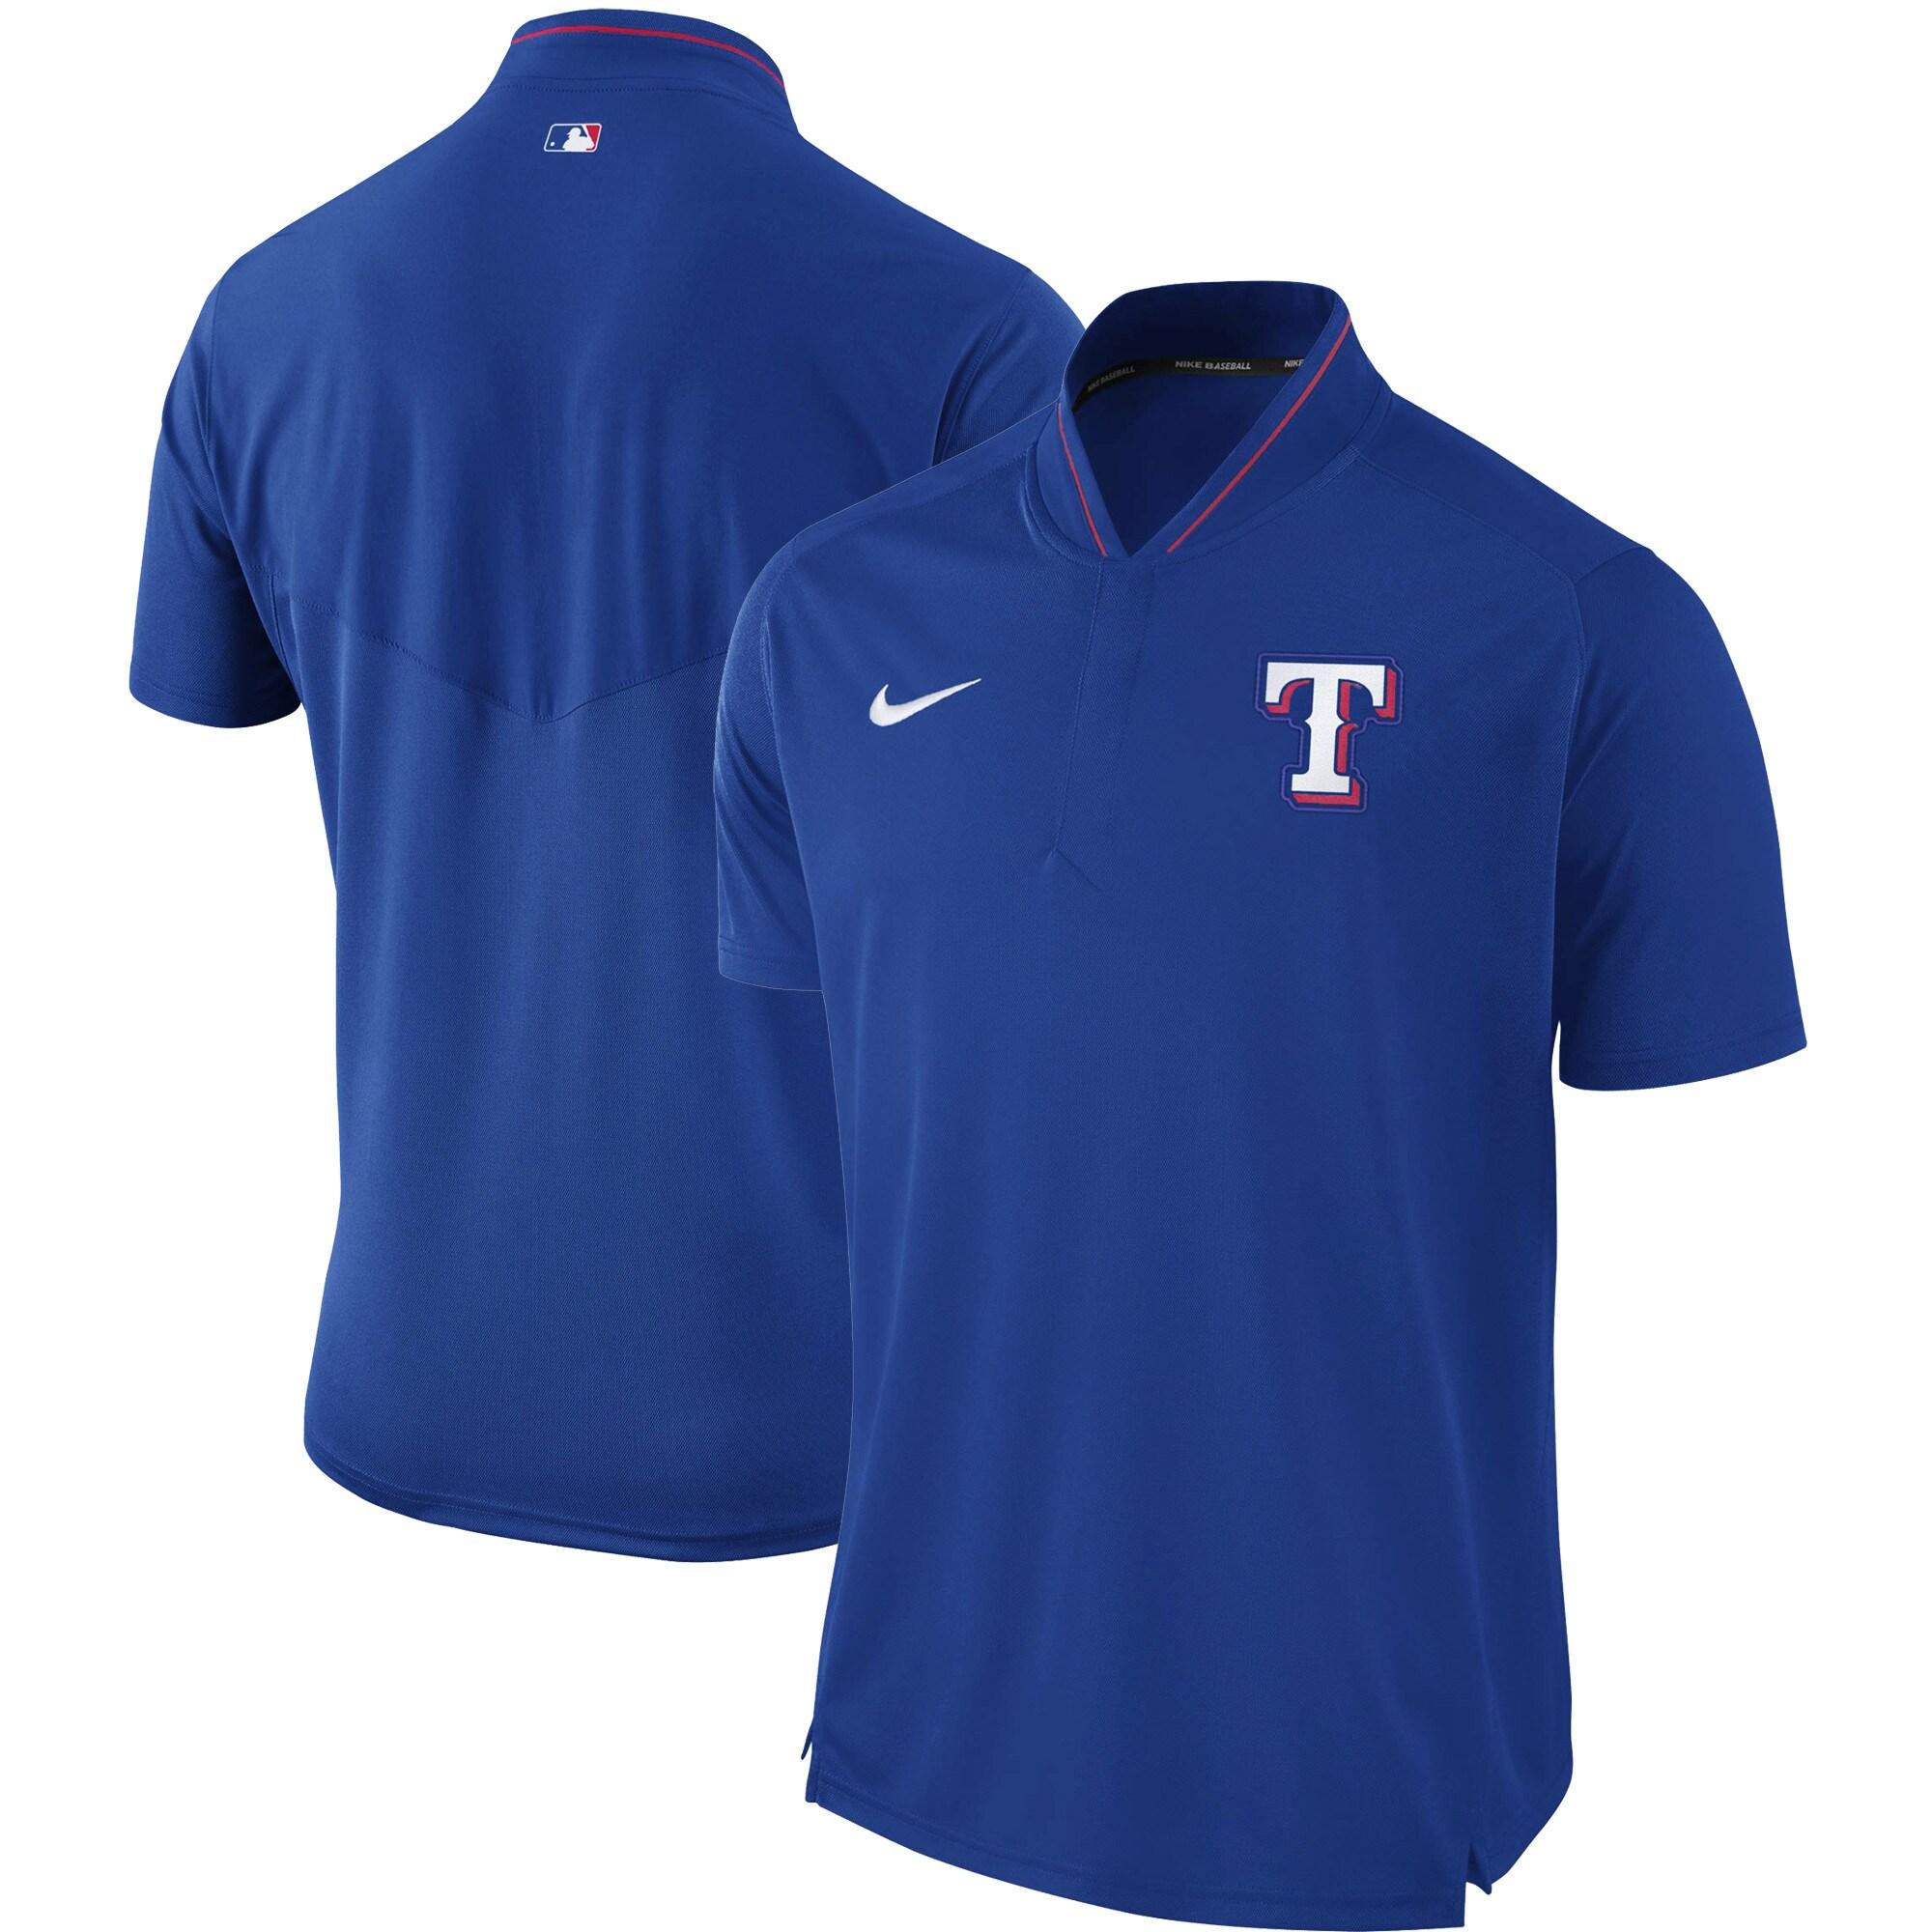 Texas Rangers Nike Authentic Collection Elite Performance Polo - Royal